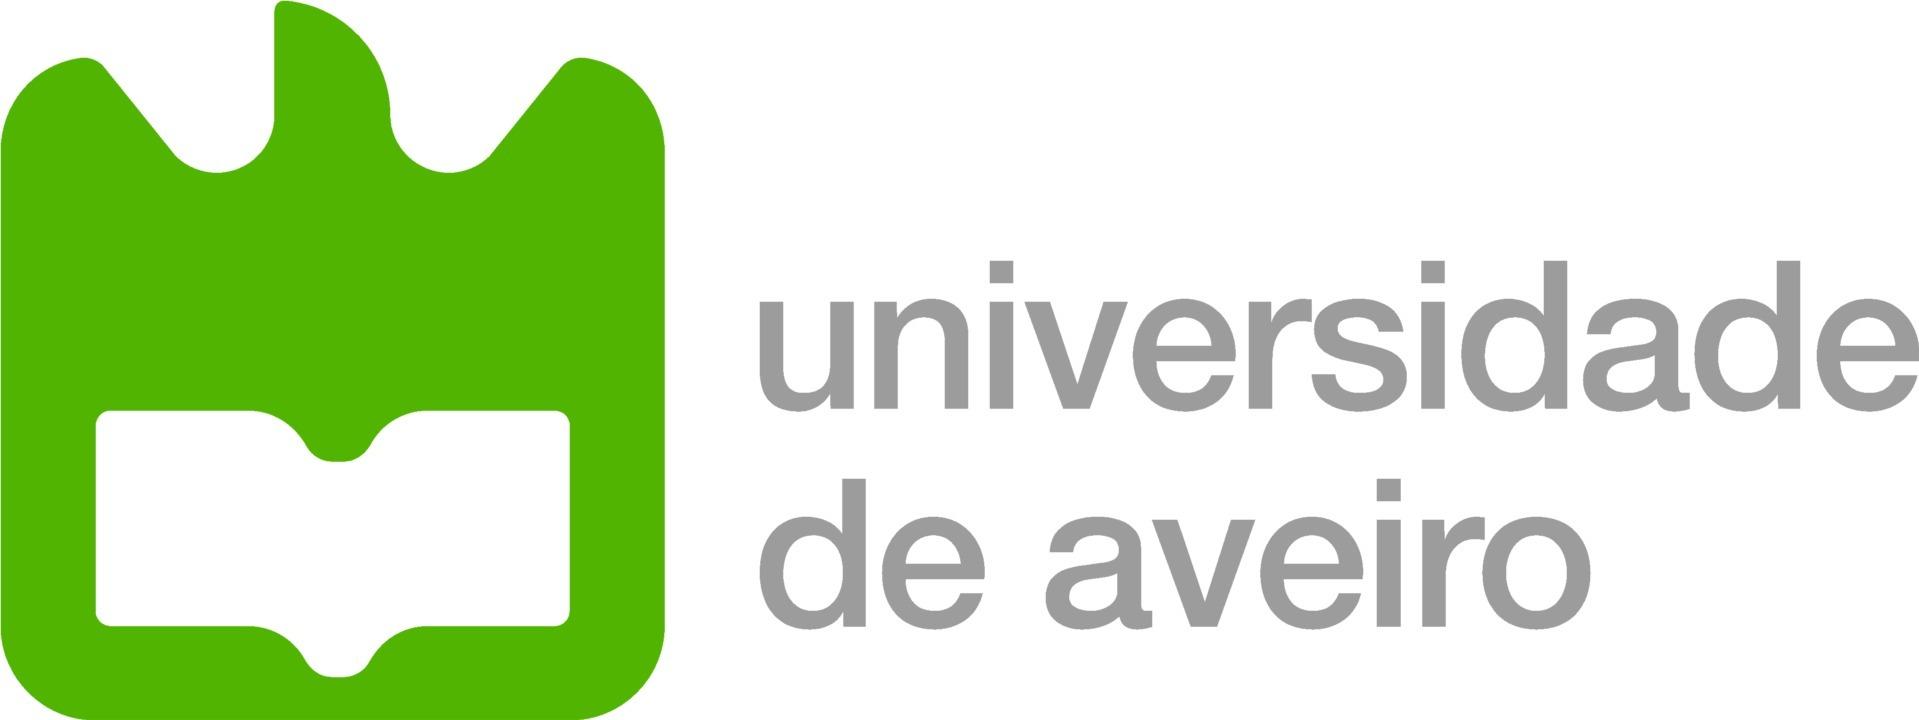 logo universidad de aveiro